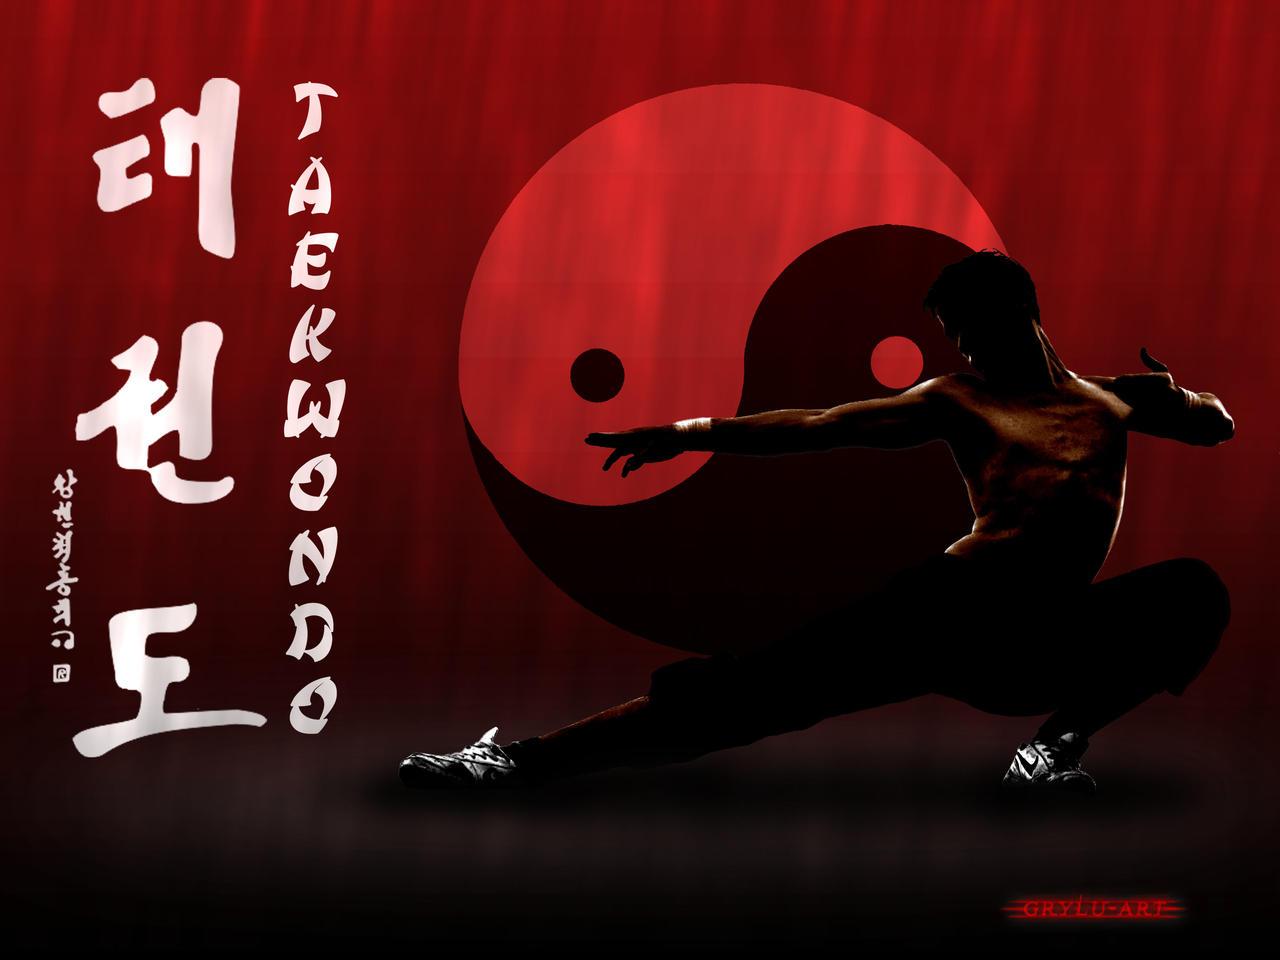 martial arts taekwondo by grylu3